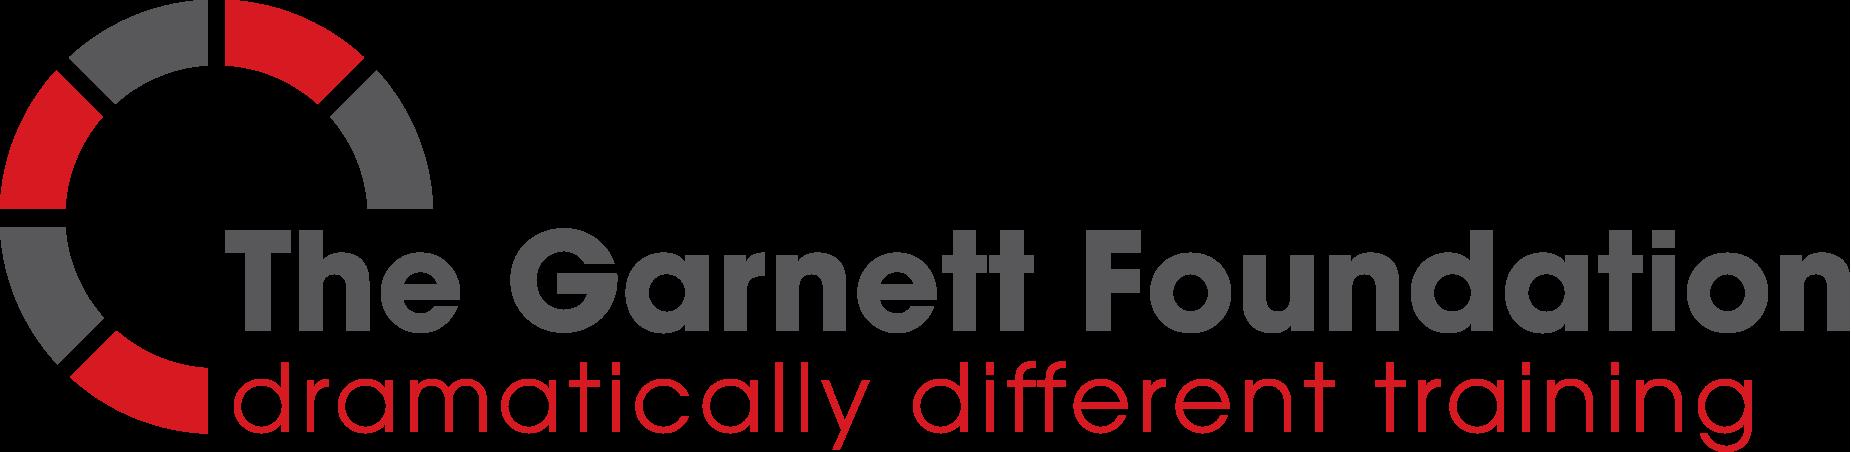 The Garnett Foundation